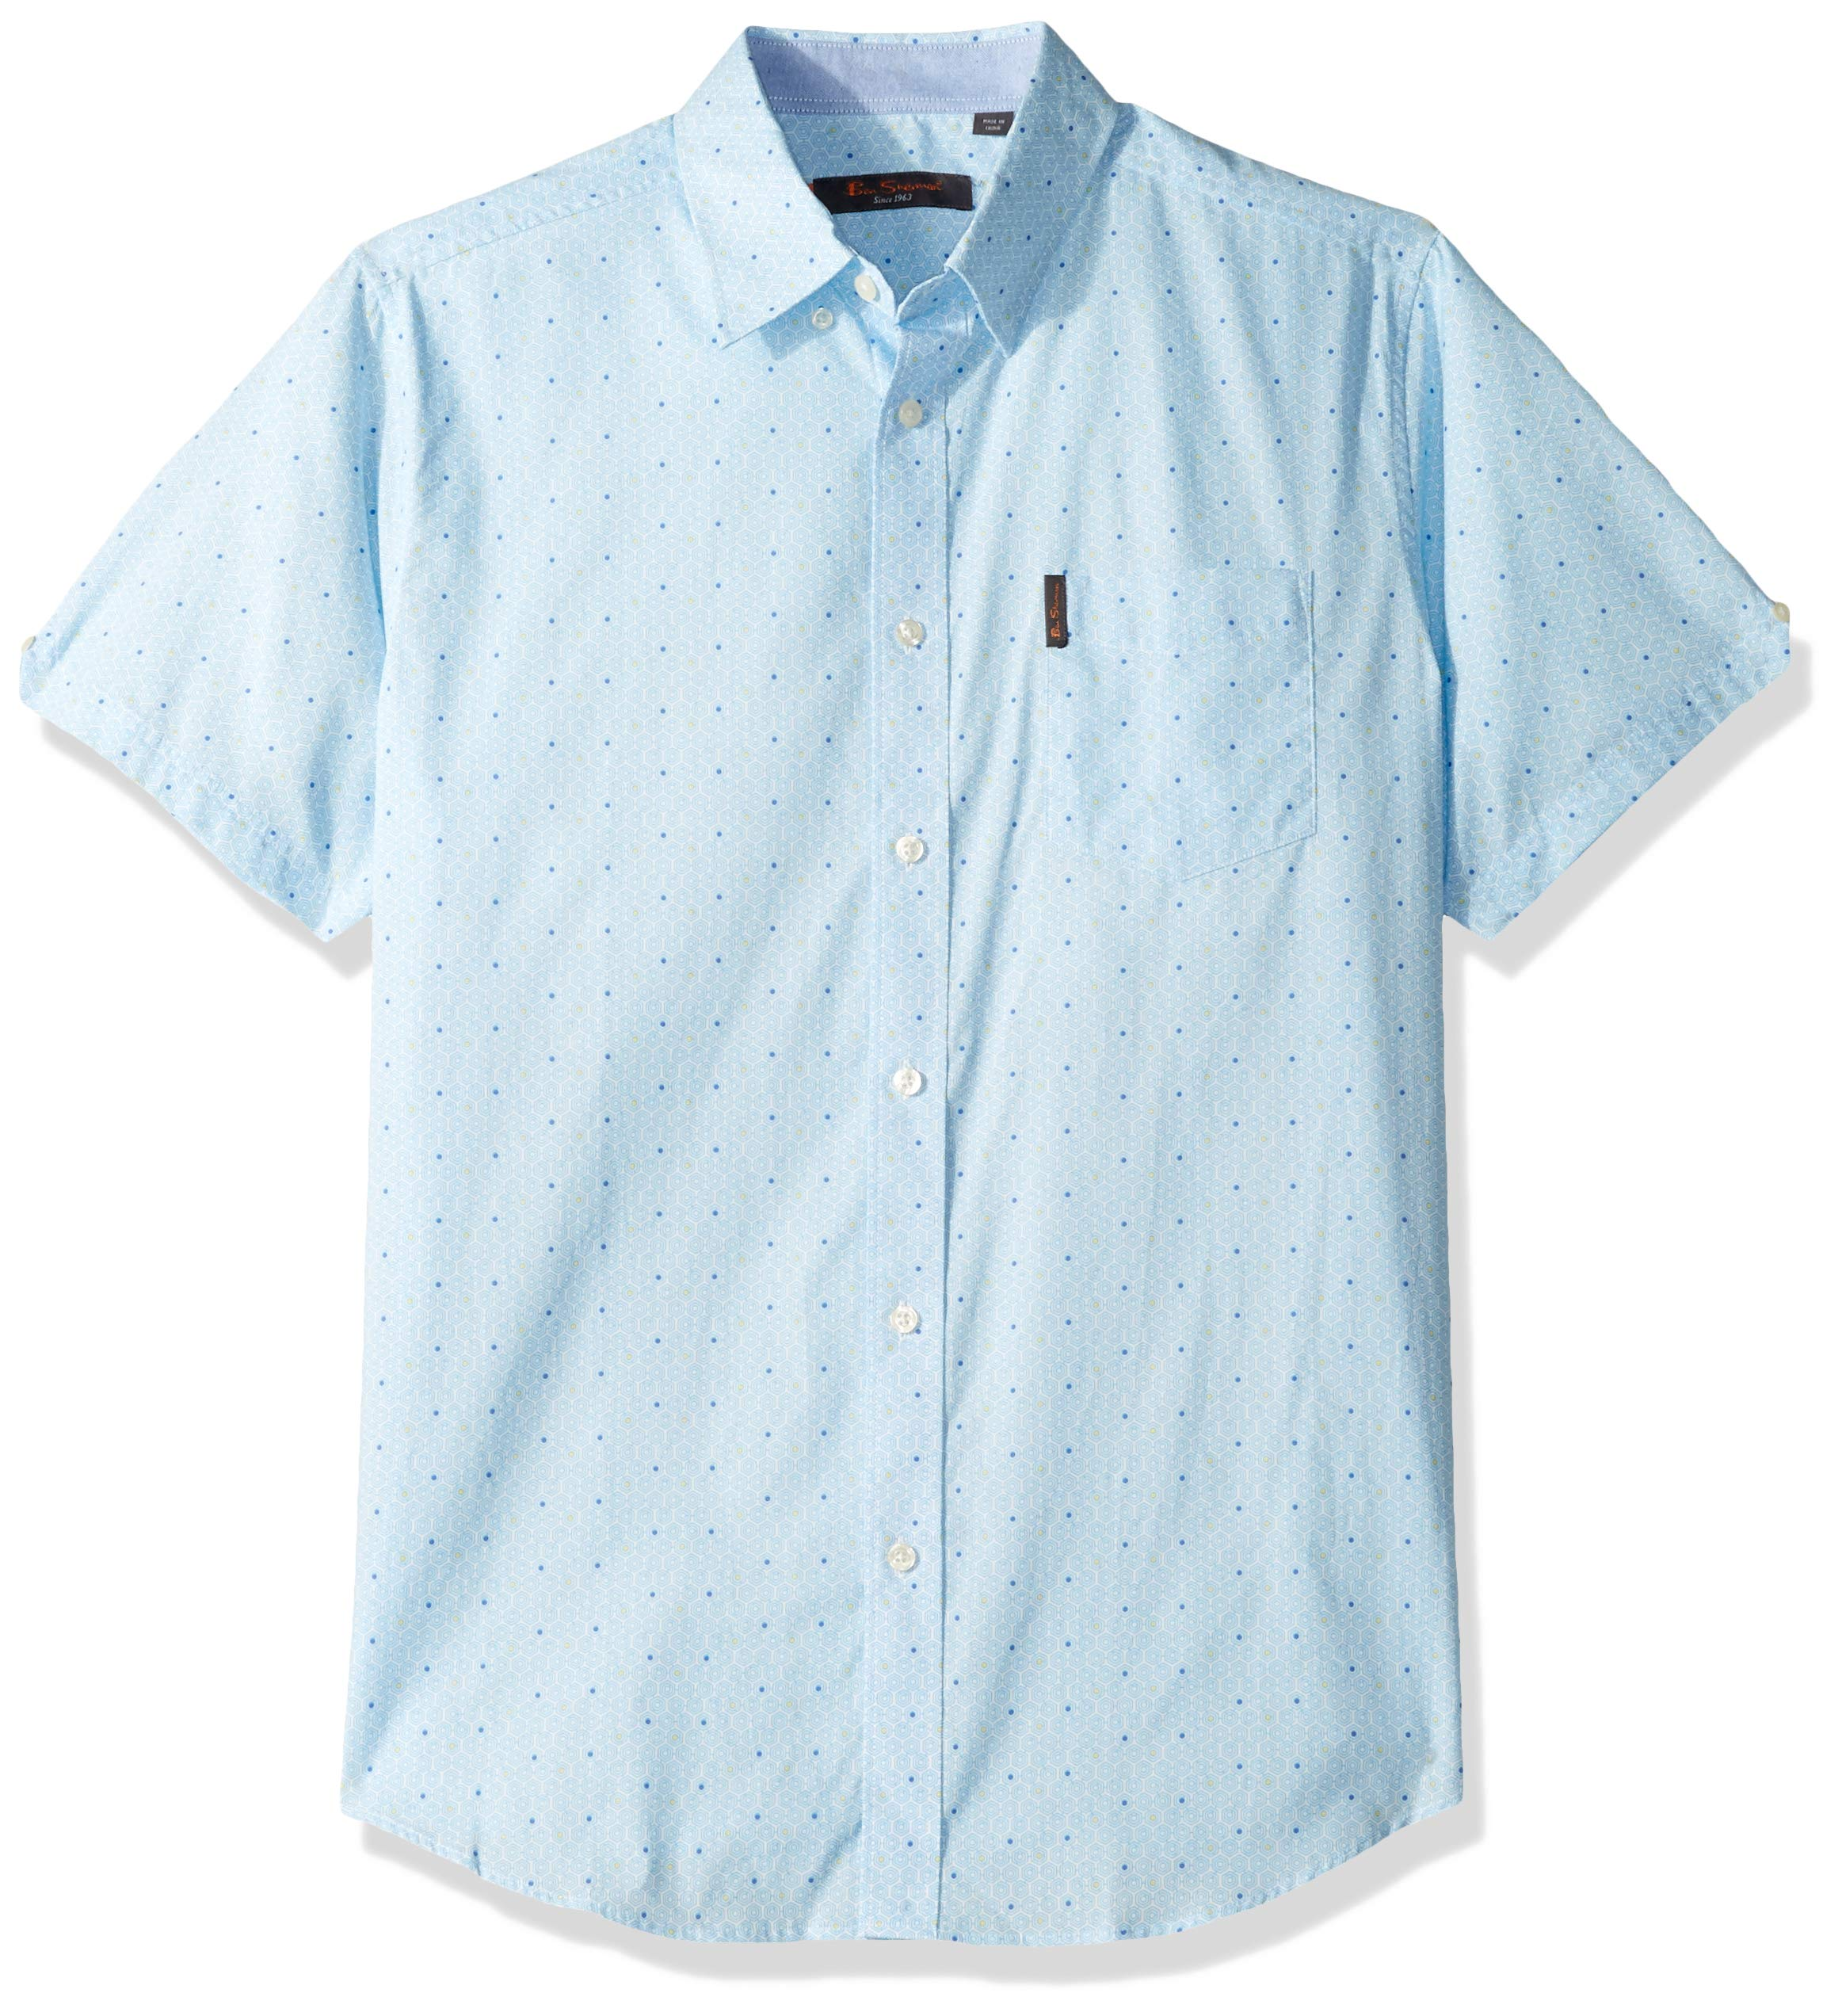 Ben Sherman Mens Ss Geo Spot Print Shirt